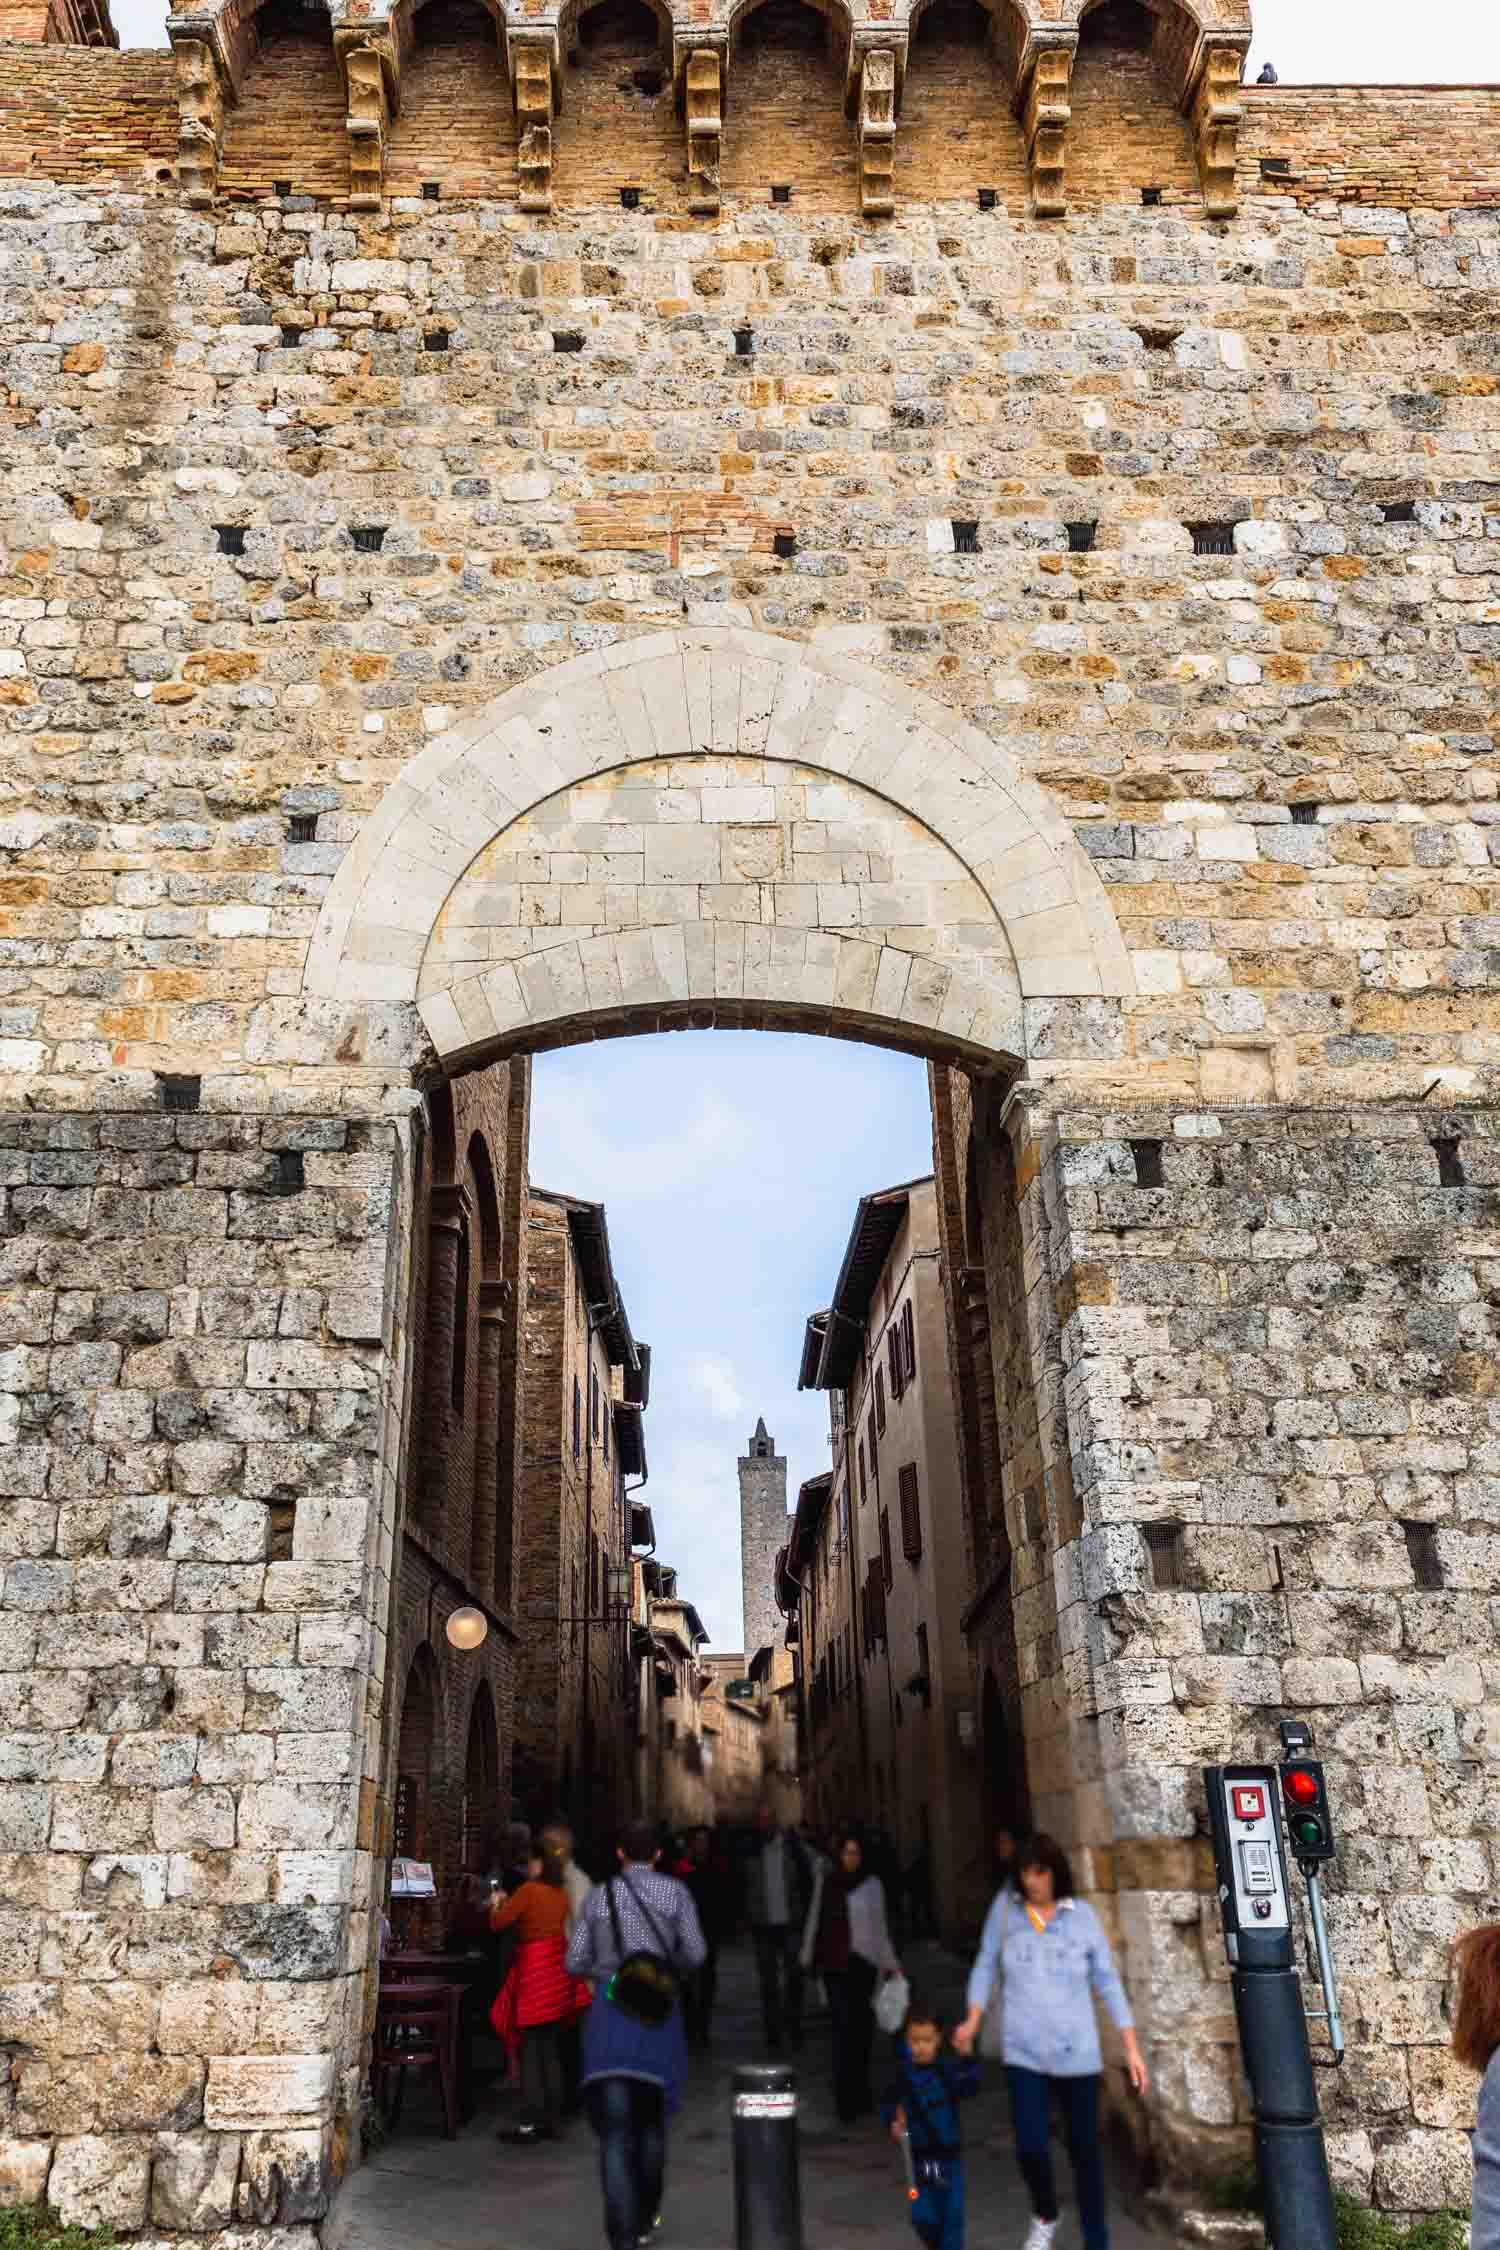 The entrance to San Gimignano, Italy. #tuscany #travel #italy #italianfarmhouse #olivegroves #towers #vineyards #italyinautumn #veganrestaurant #vegantravel #italytravel #veganitaly #vegantuscany #veganhotel #ecotourism #organichotel #veganhotel #veganretreat #veganbedandbreakfast #sangimignano